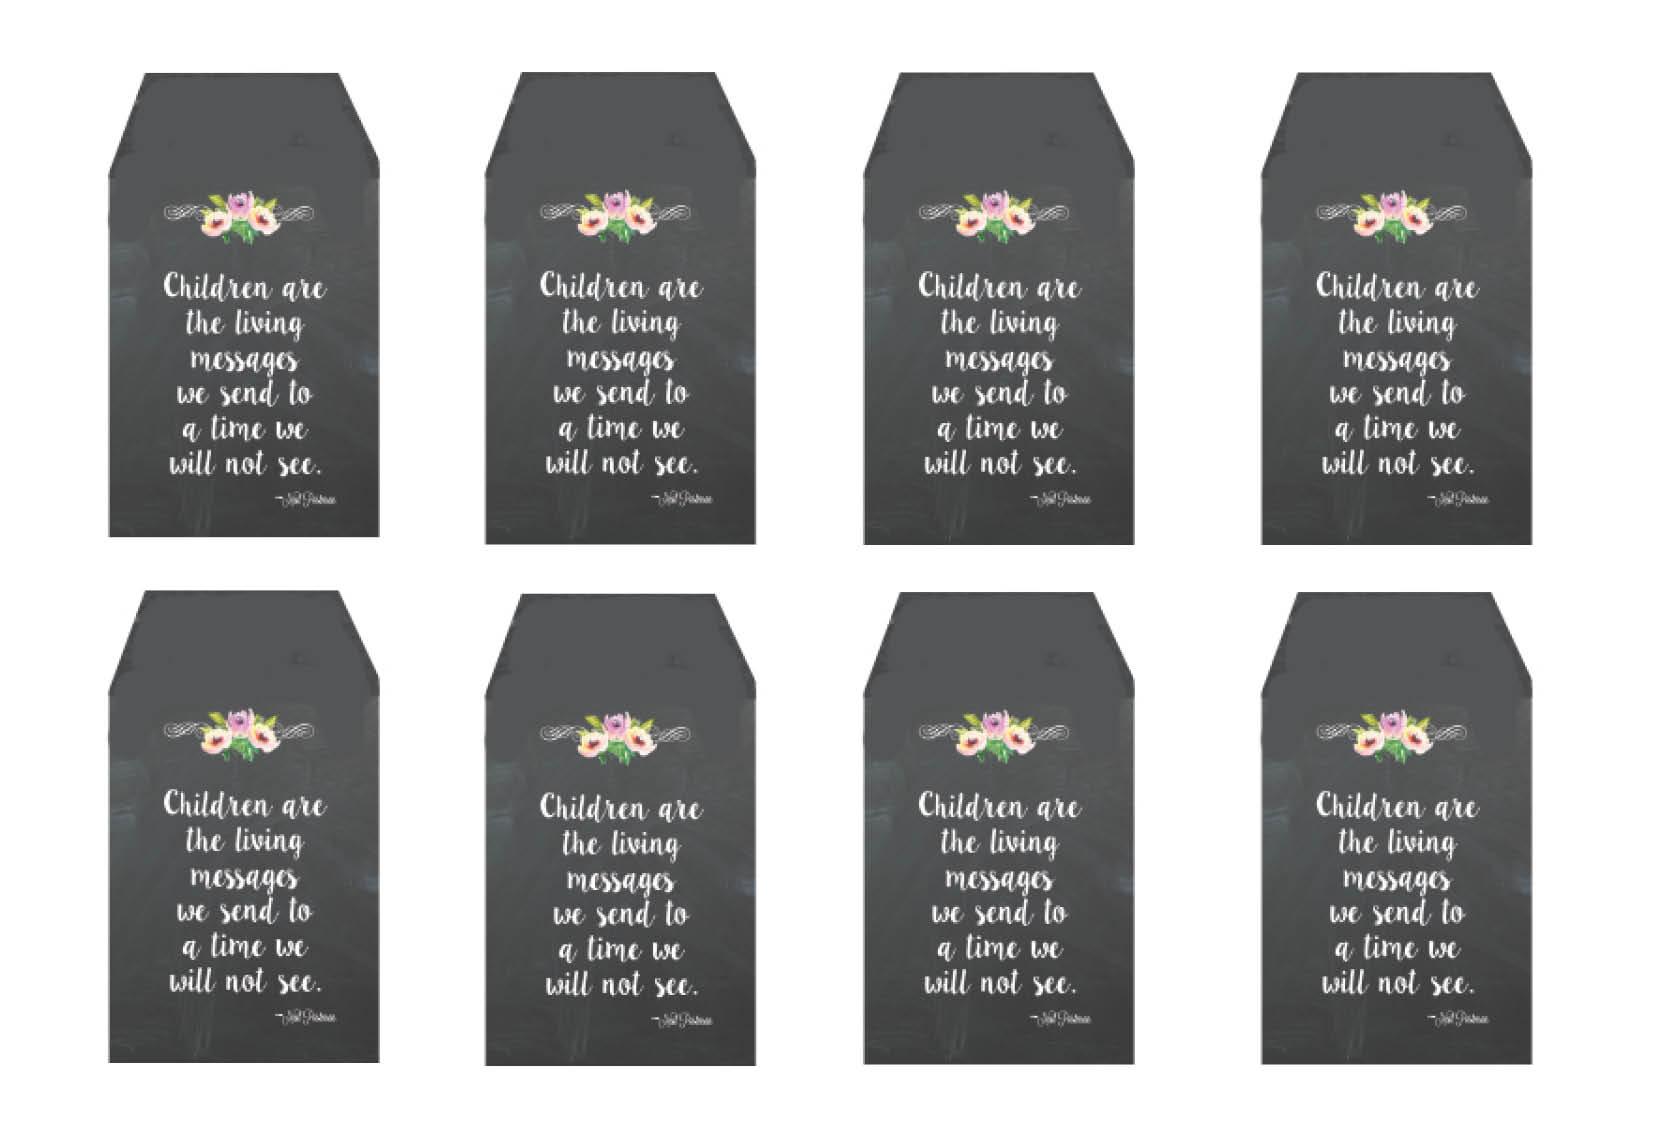 Teacher Appreciation And Free Printable Teacher Gift Tags   11 - Free Printable Tags For Teacher Appreciation